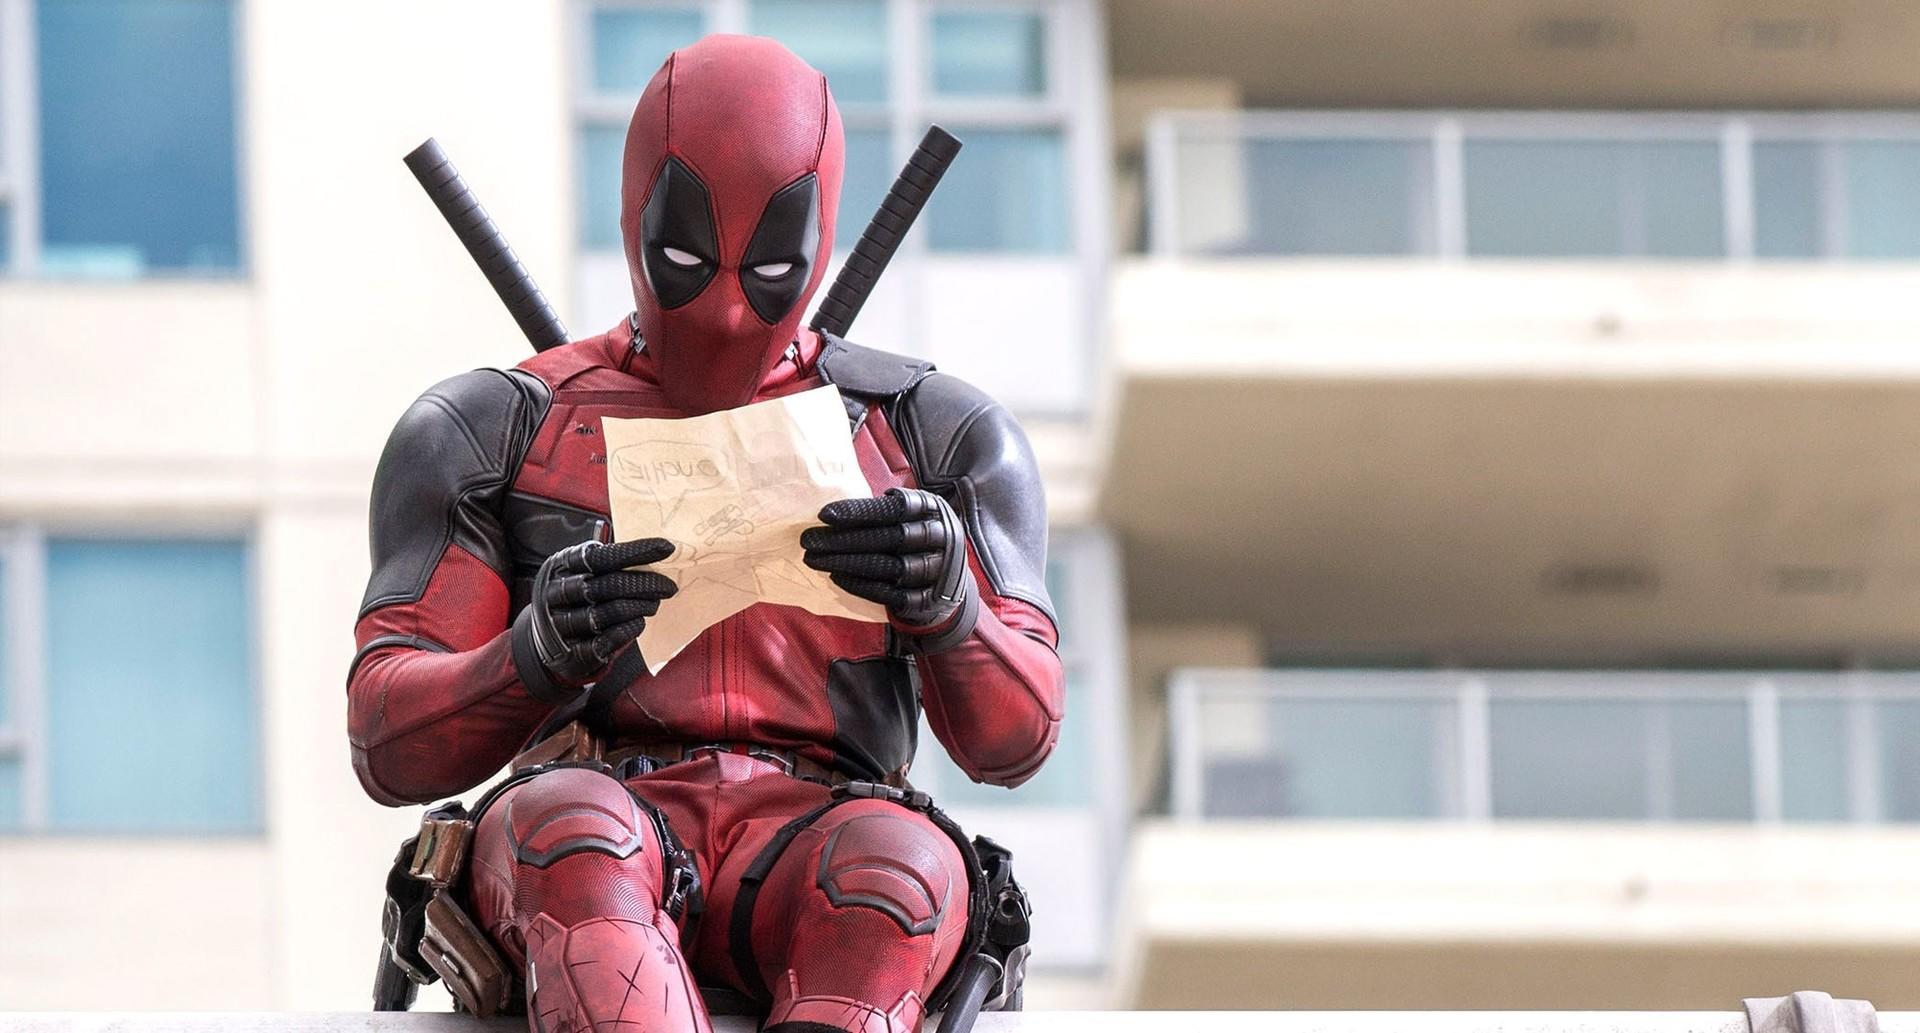 Ryan Reynolds na pele deformada de Deadpool (pic by moviepilot.de)